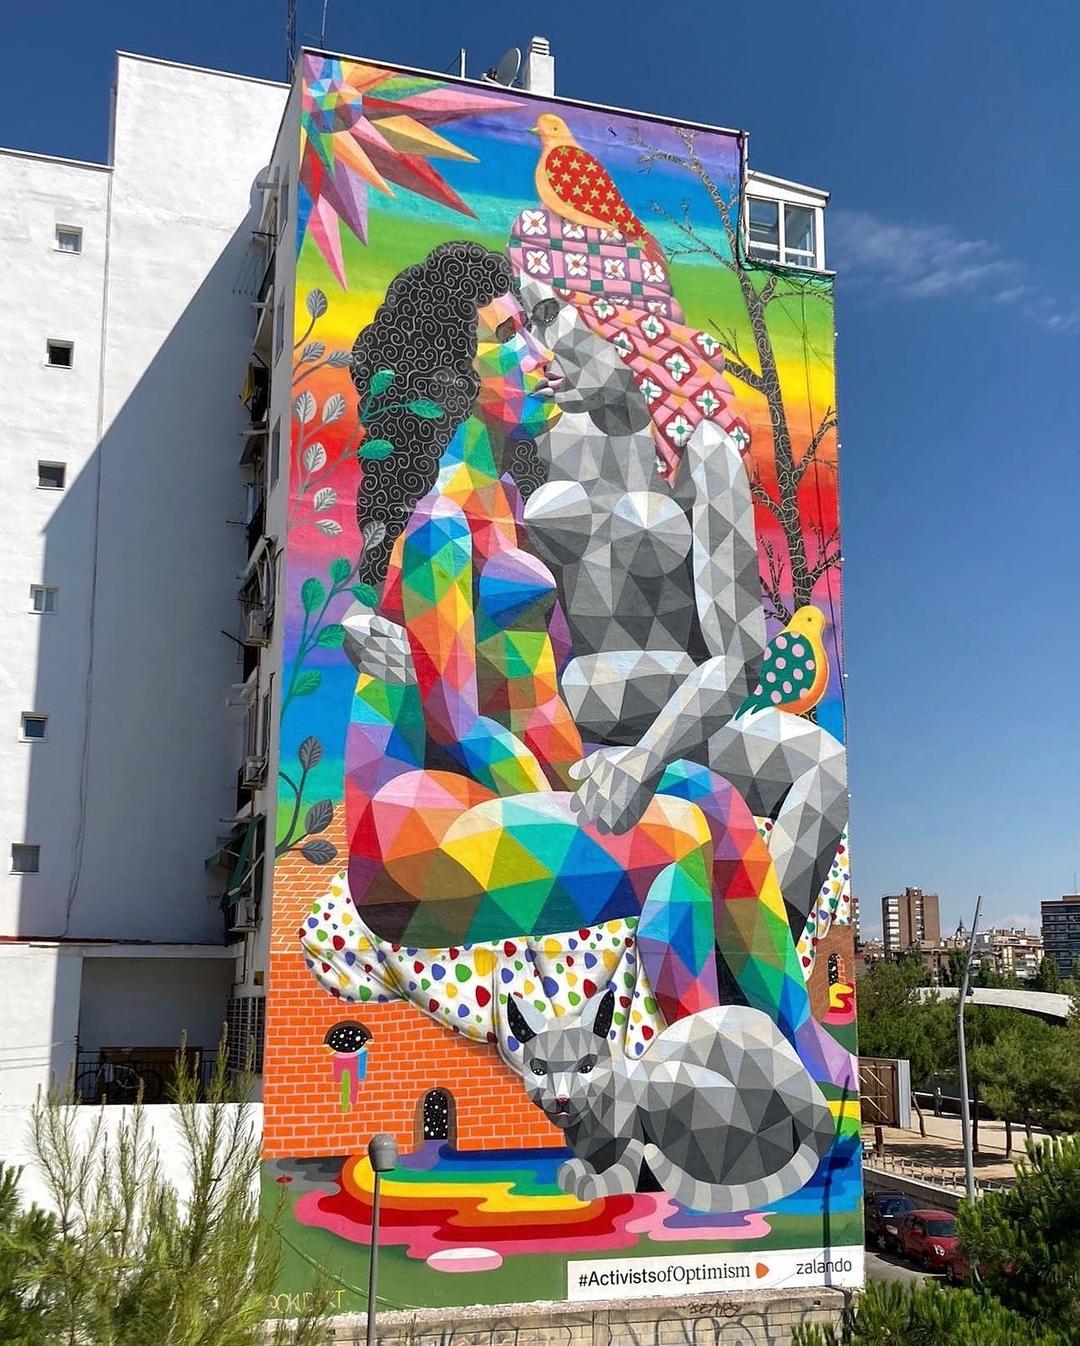 Okudart @ Madrid, Spain